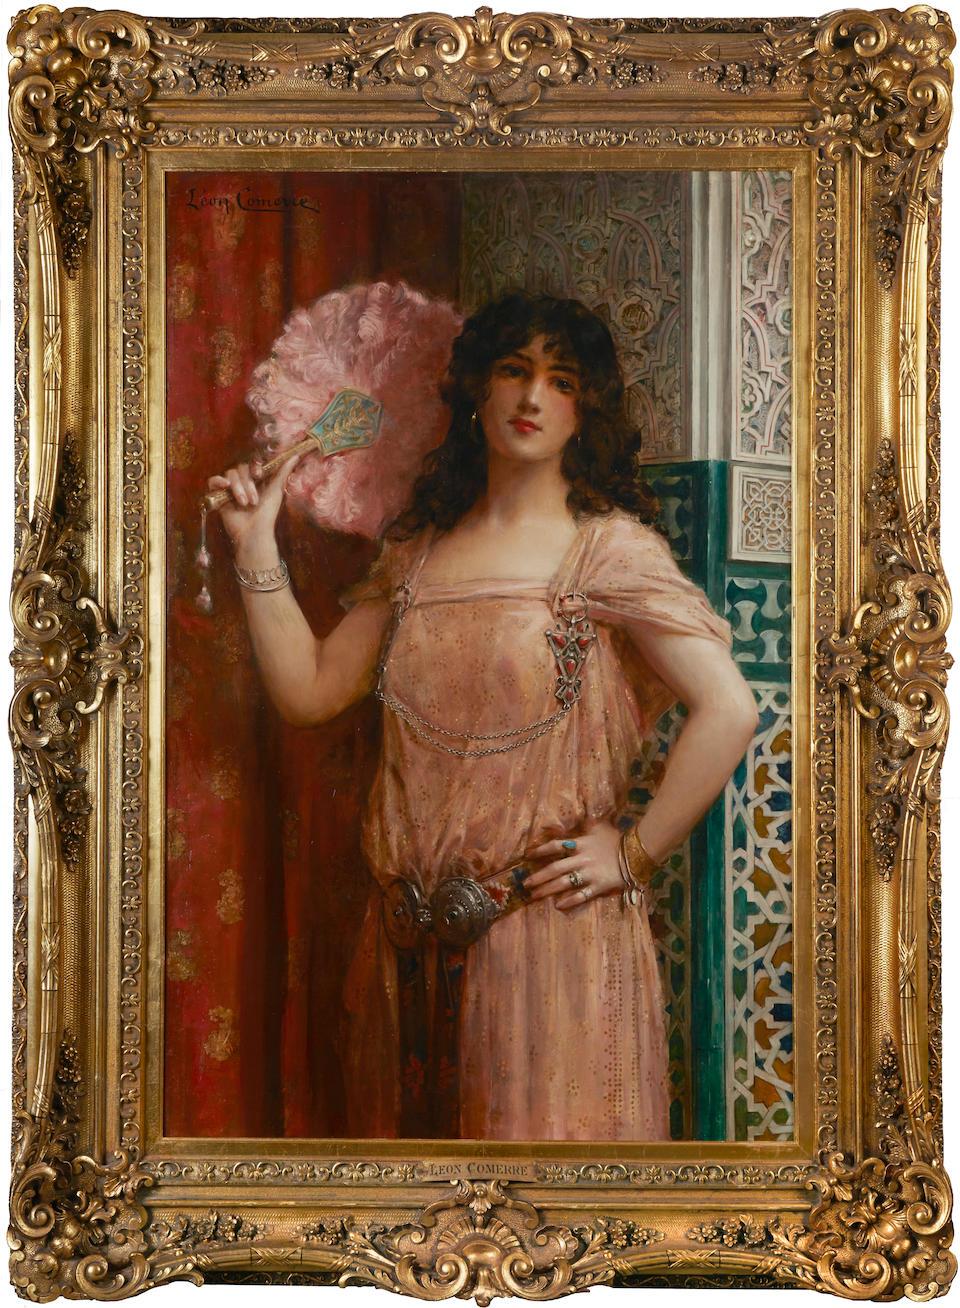 Léon François Comerre (French 1850-1916) A harem beauty holding a pink fan 46 3/4 x 30 1/2in (119 x 77.5cm)